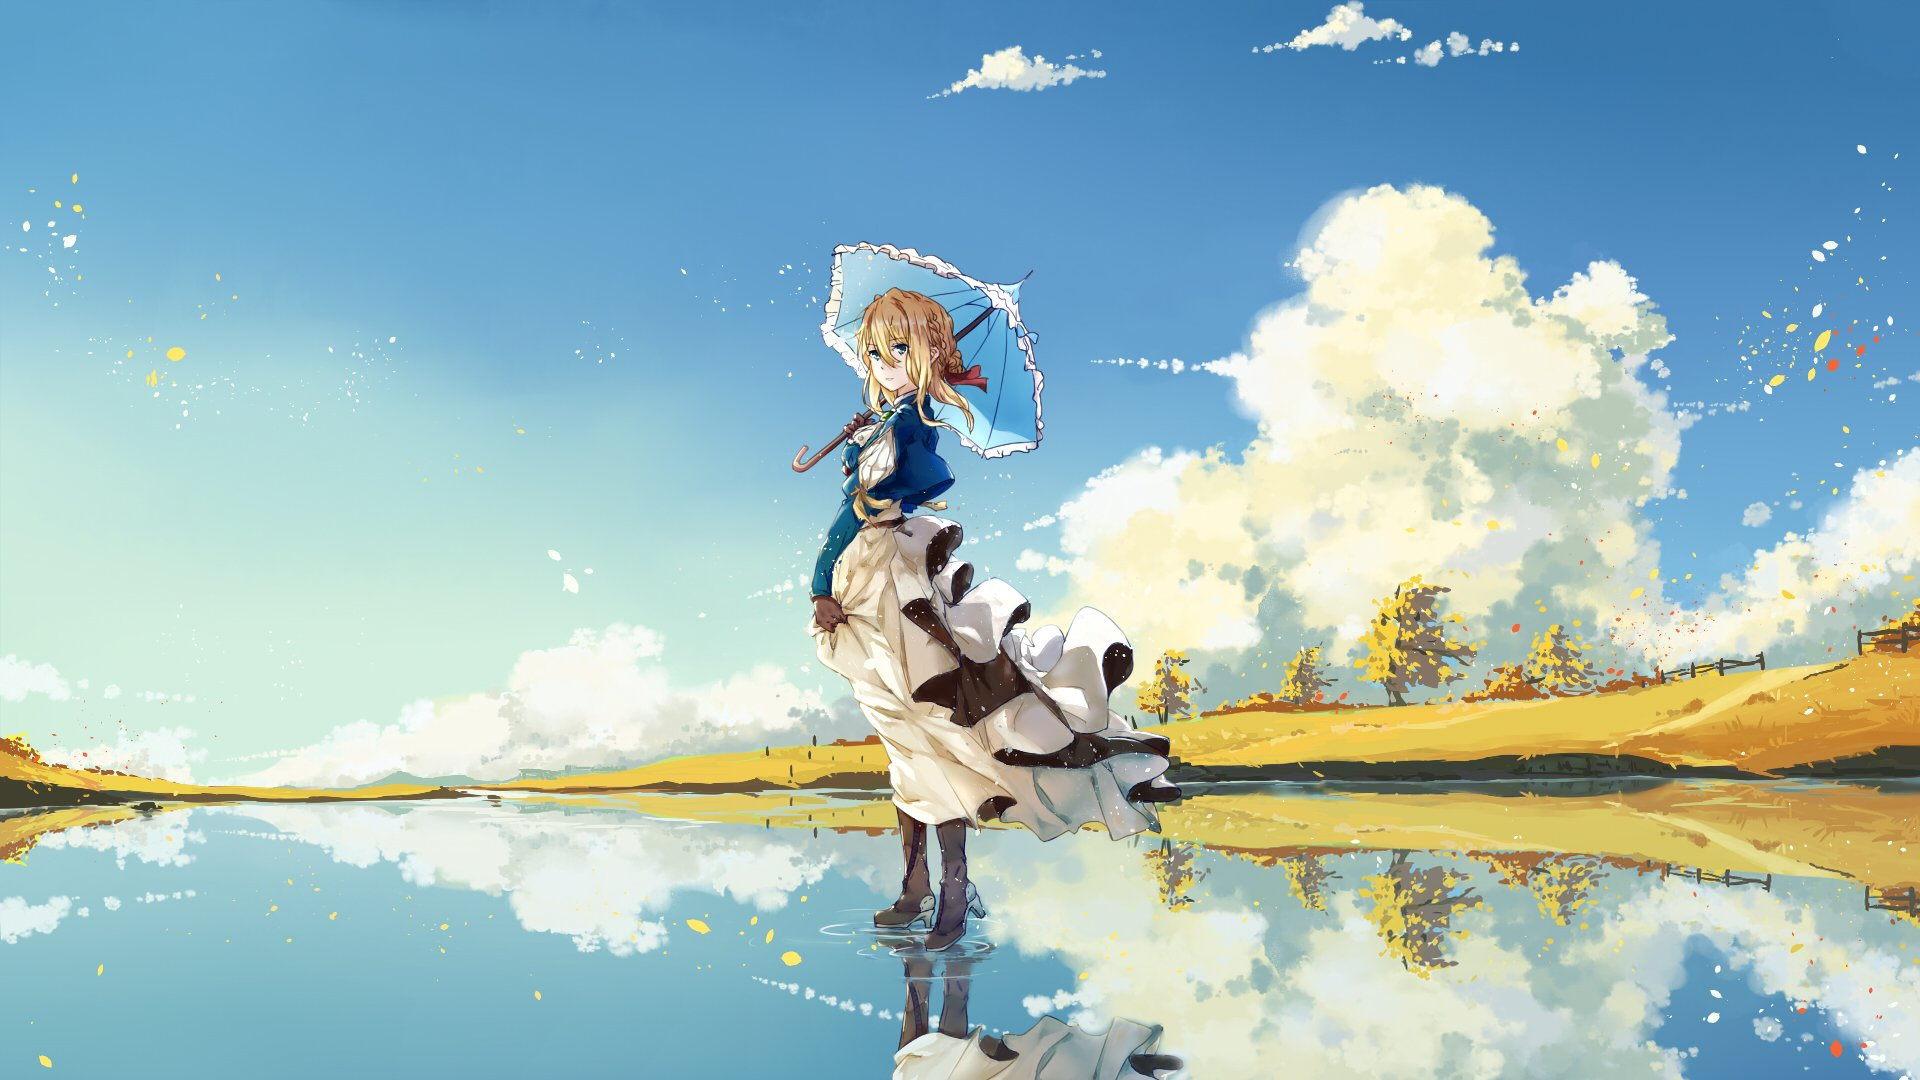 Anime - Violet Evergarden  Violet Evergarden (Character) Bakgrund